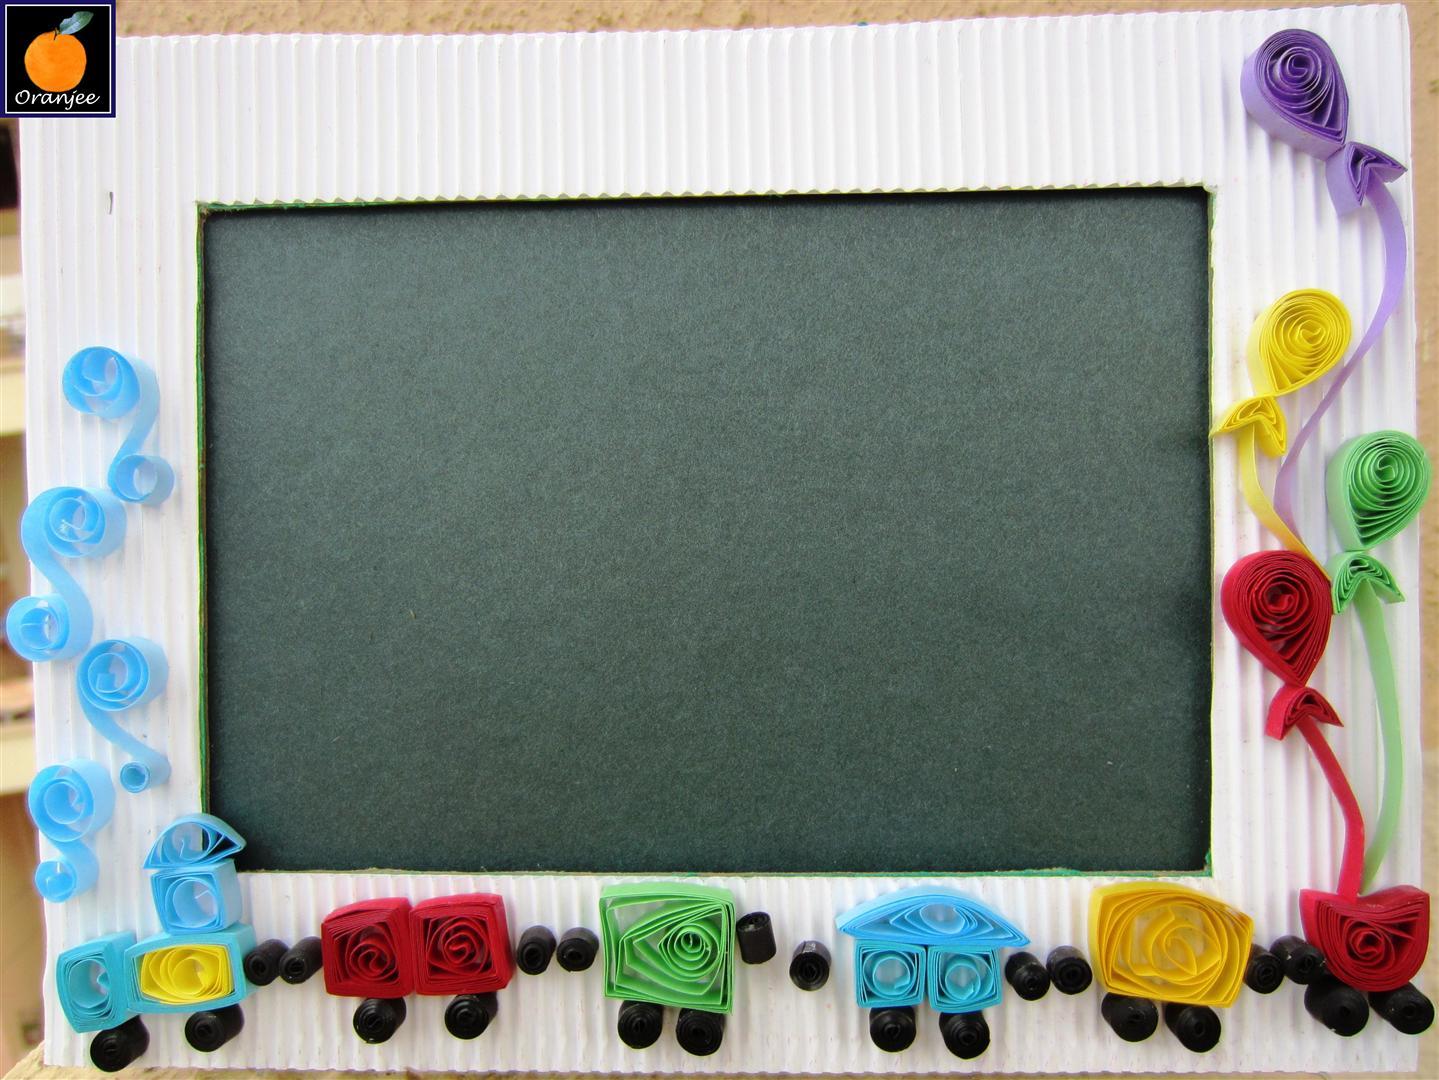 My craft work: Train frame